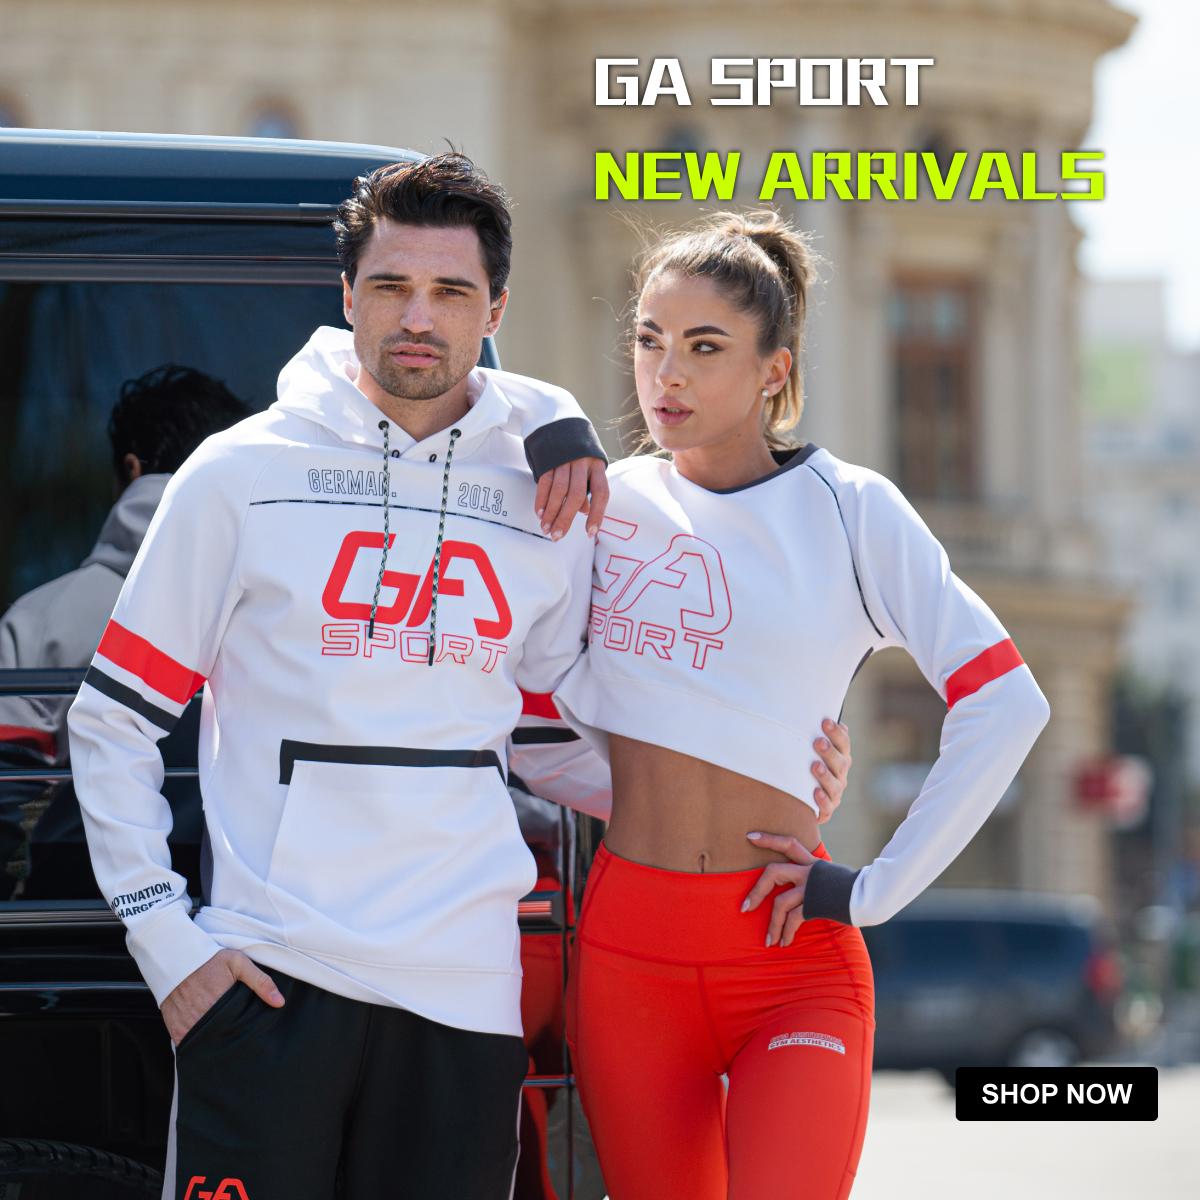 GA Sport - New Arrivals   Gym Aesthetics